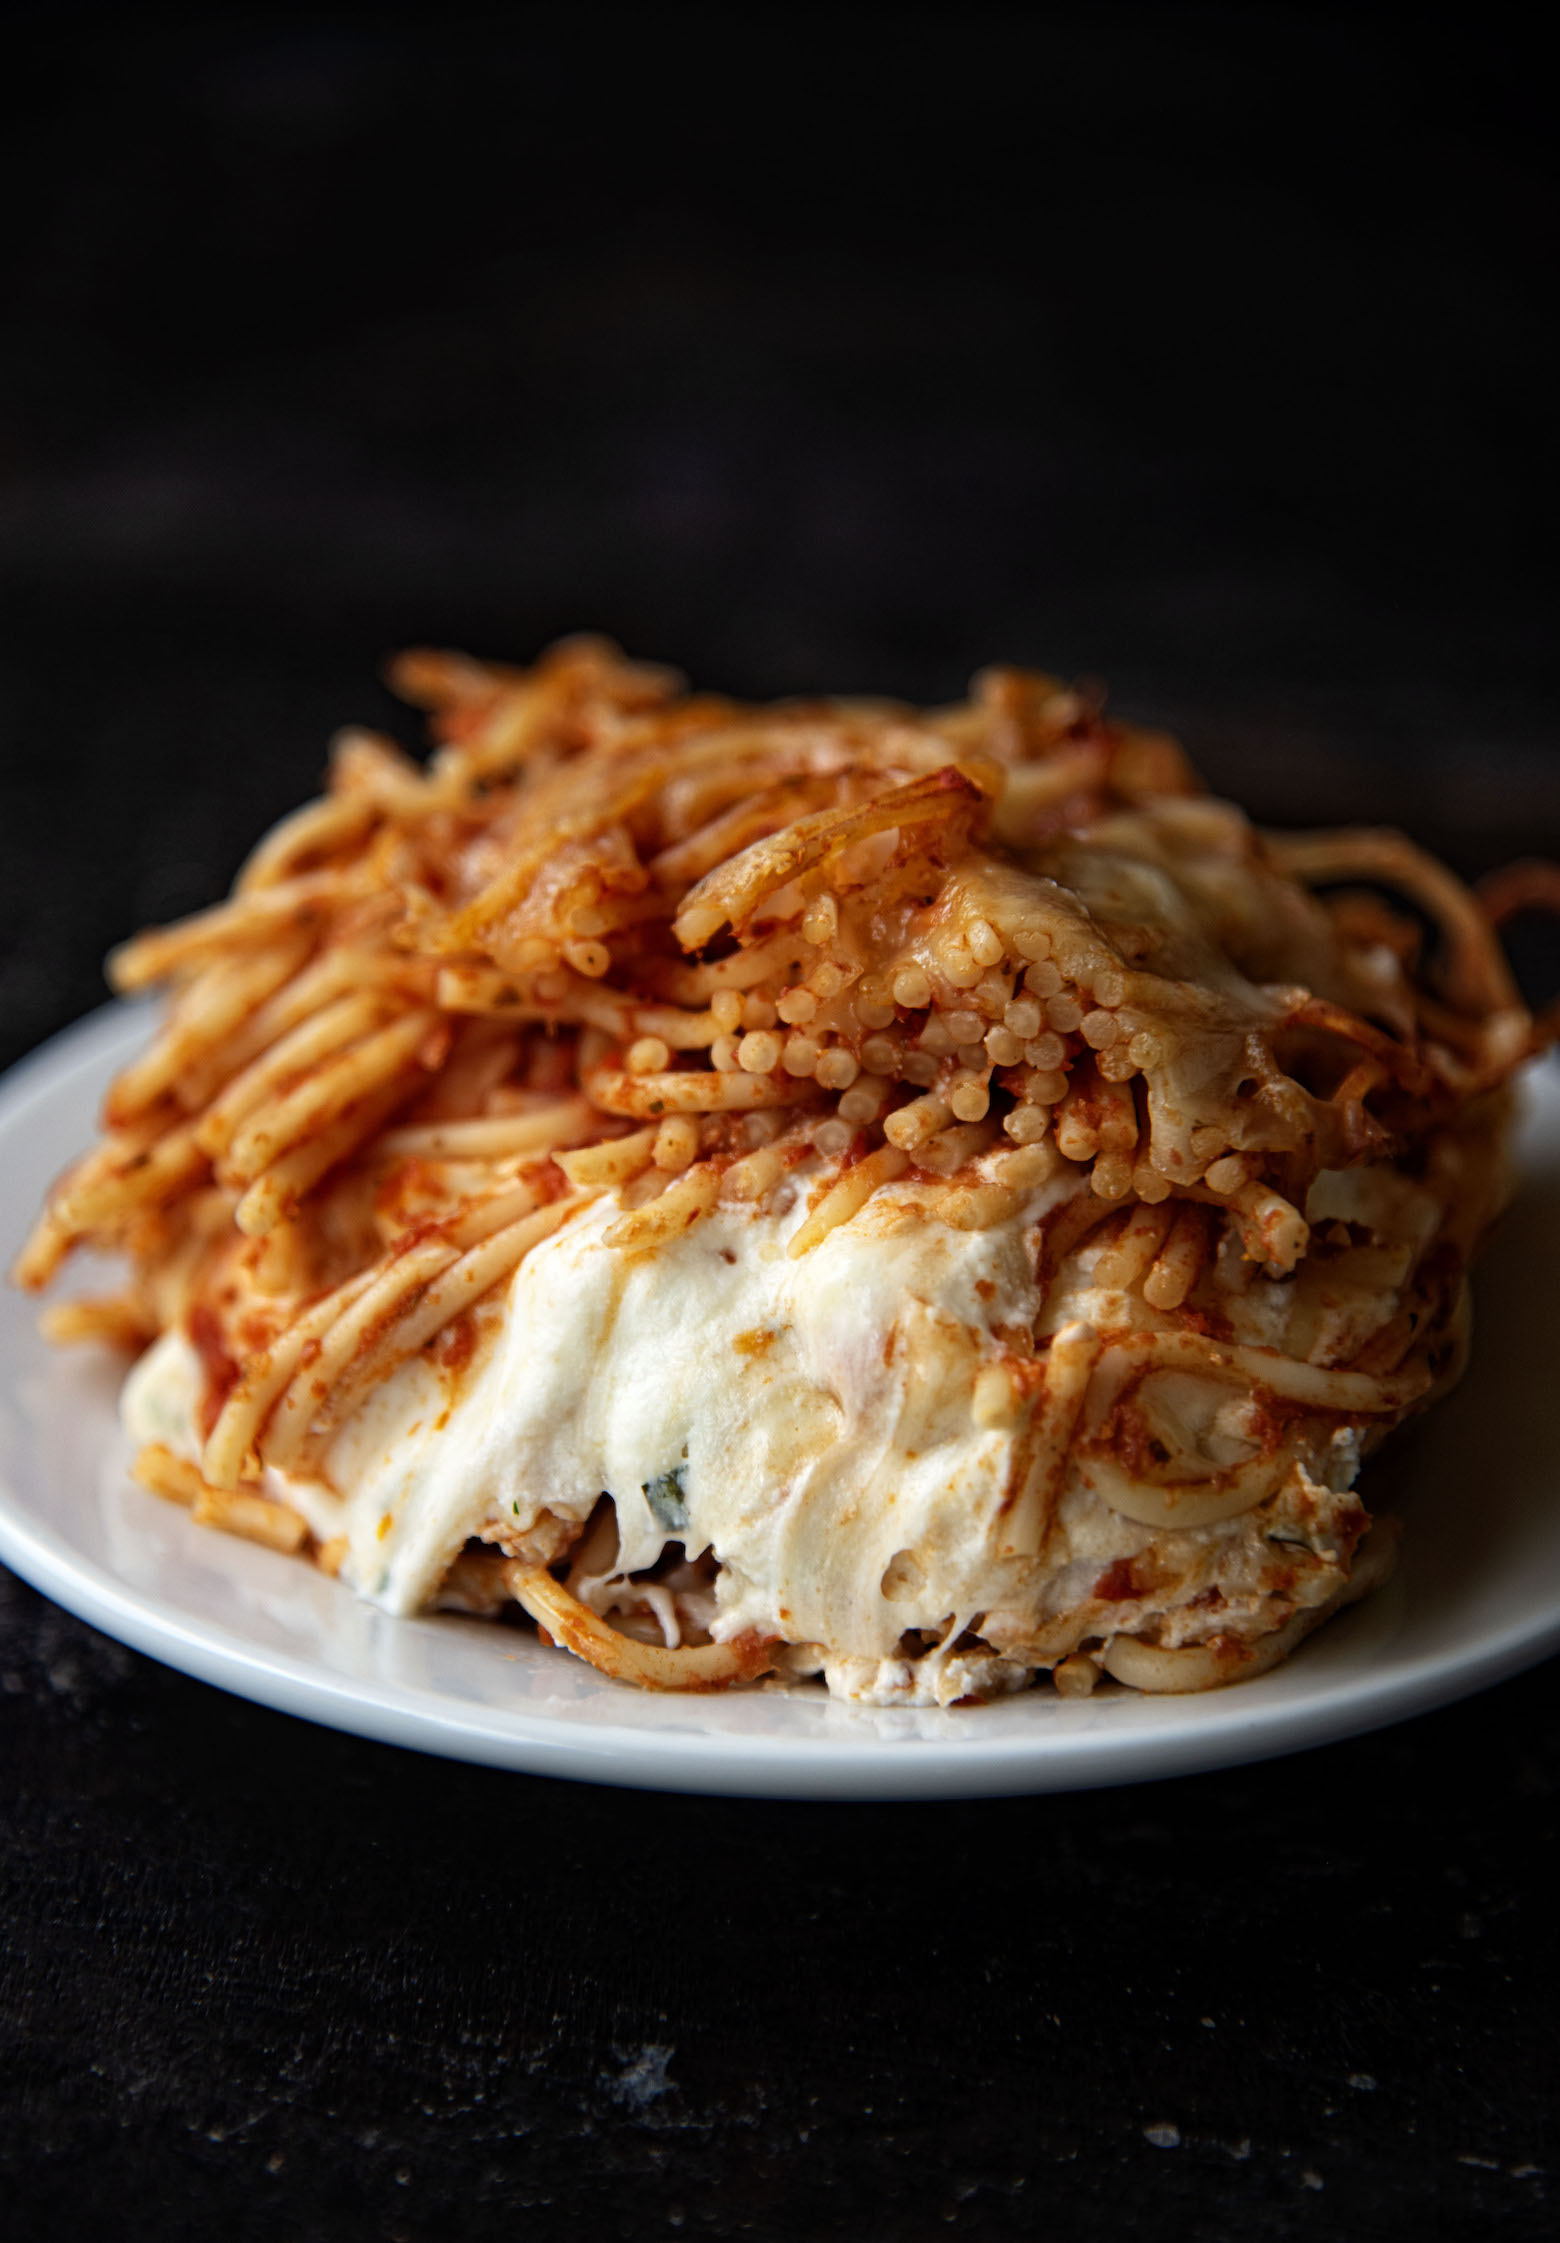 Easy Baked Spaghetti Casserole